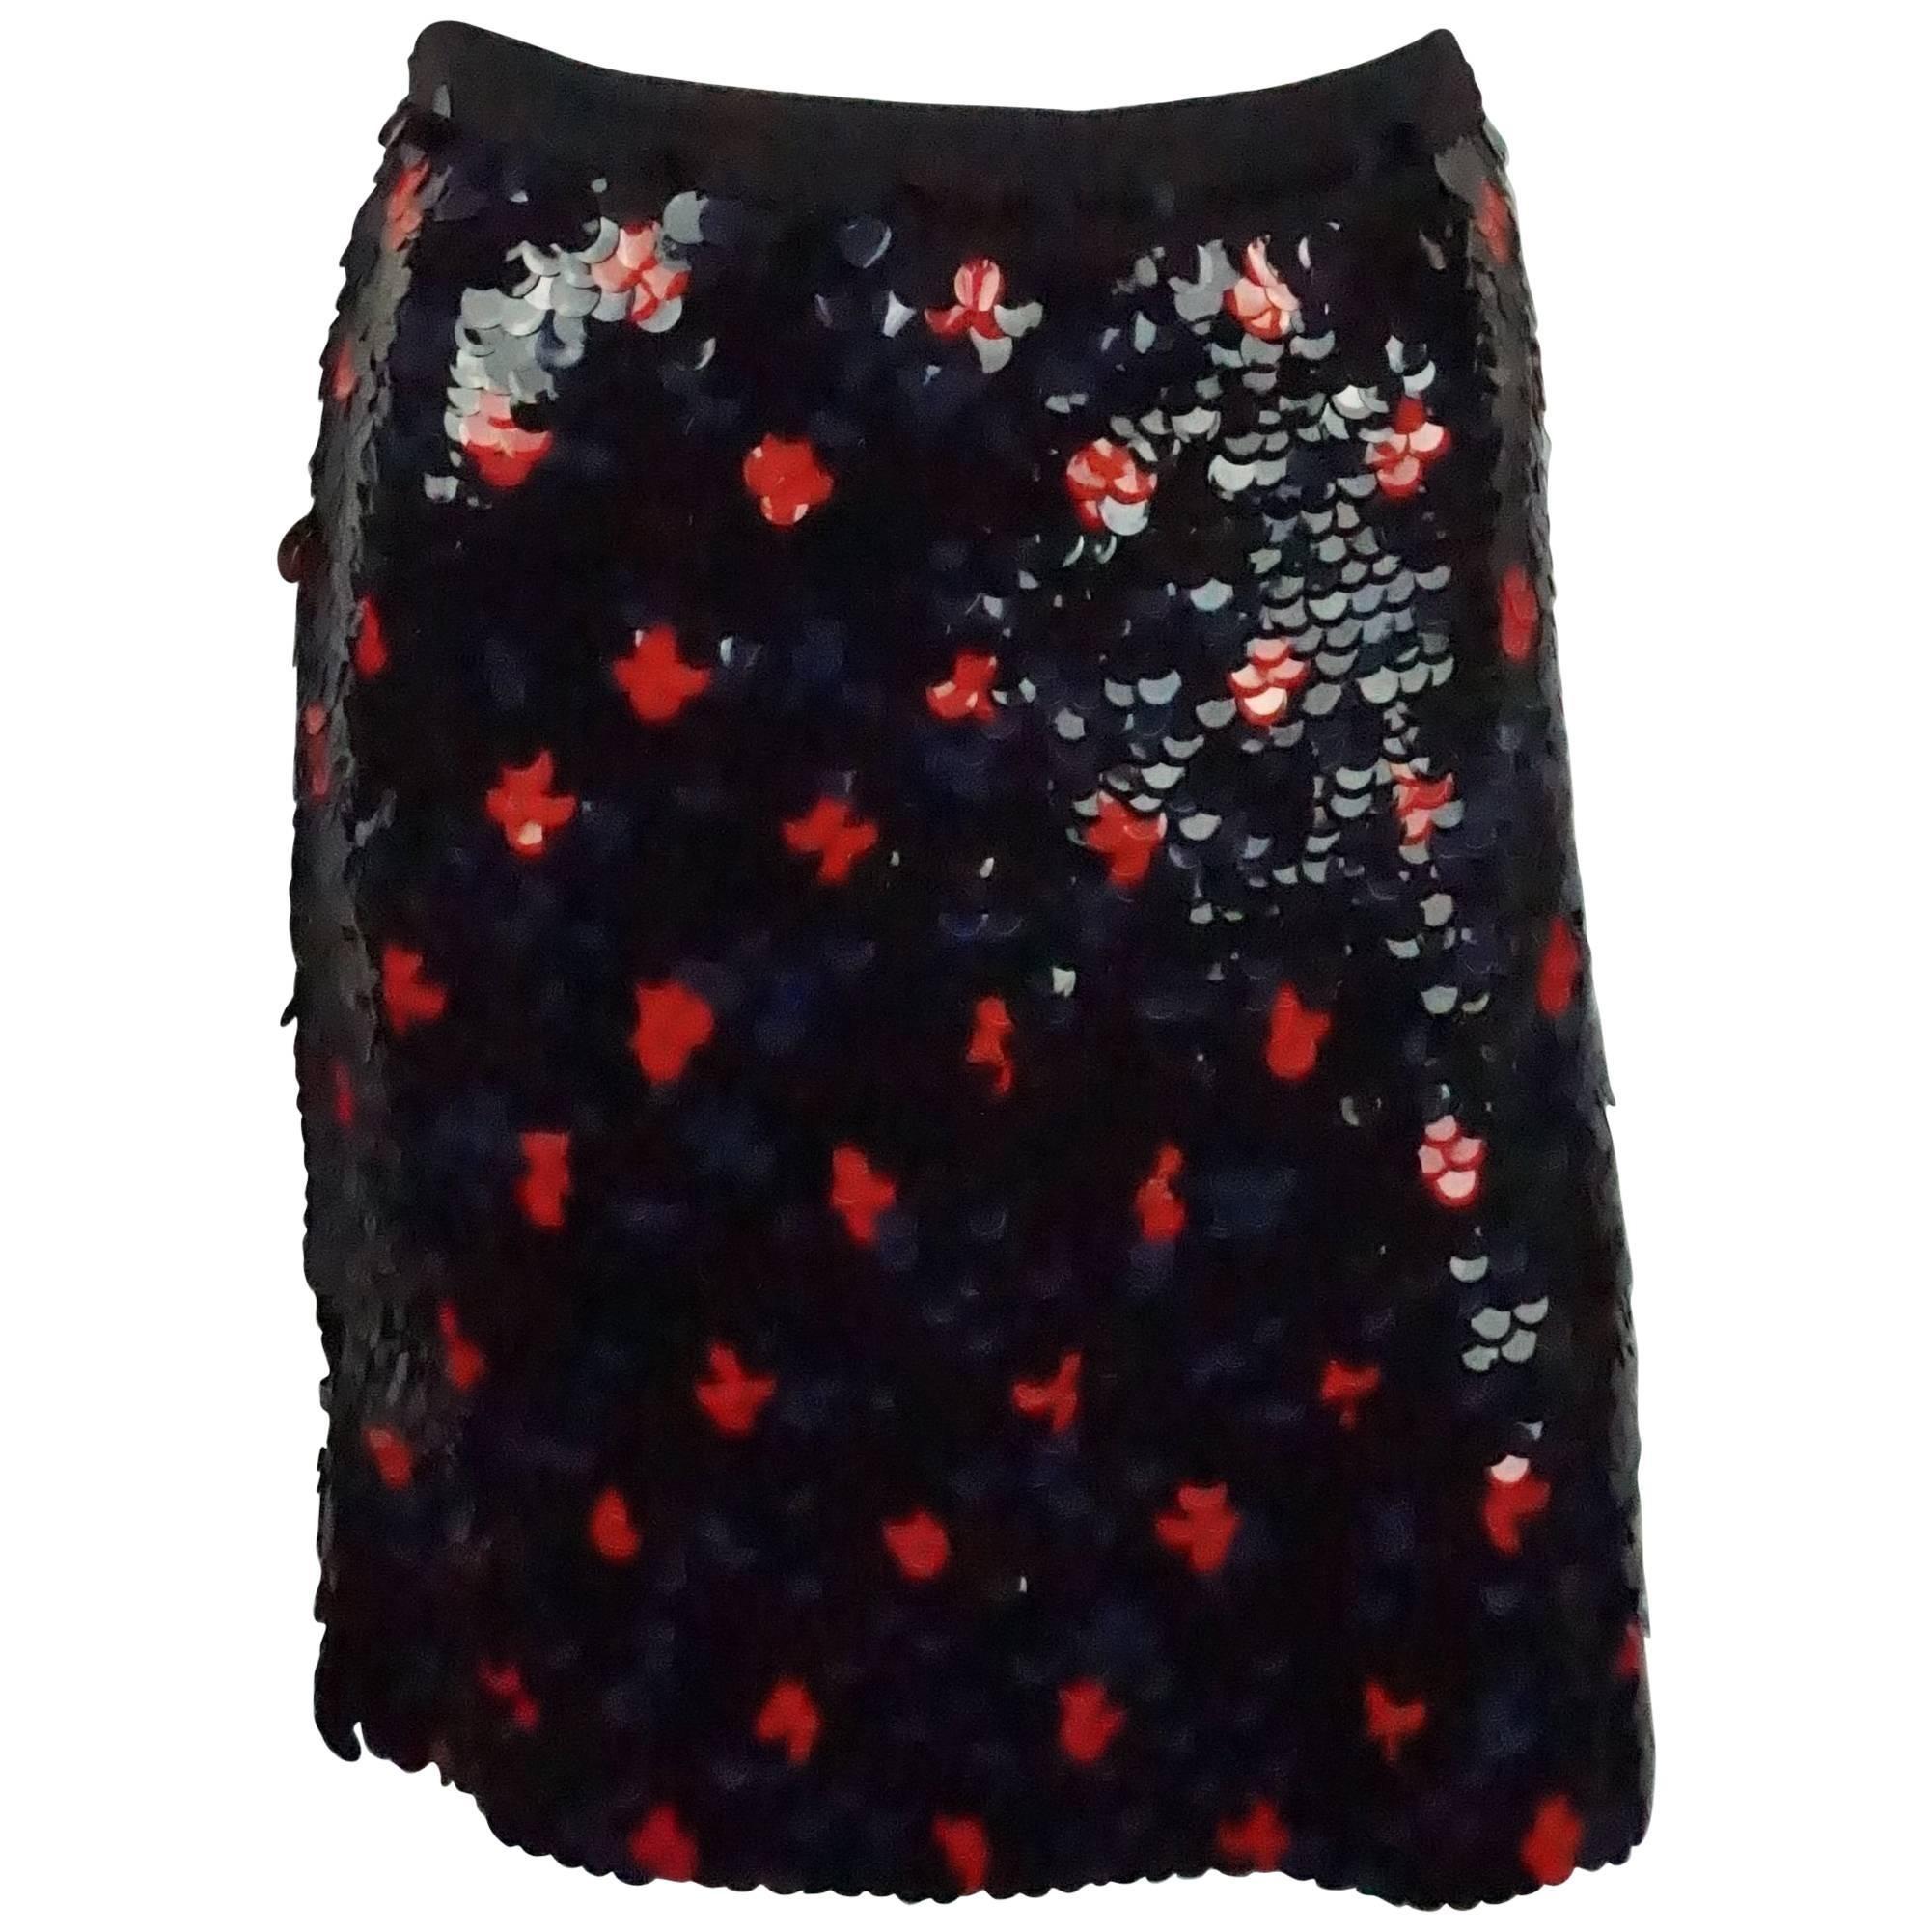 Derek Lam Navy and Red Paillete Skirt